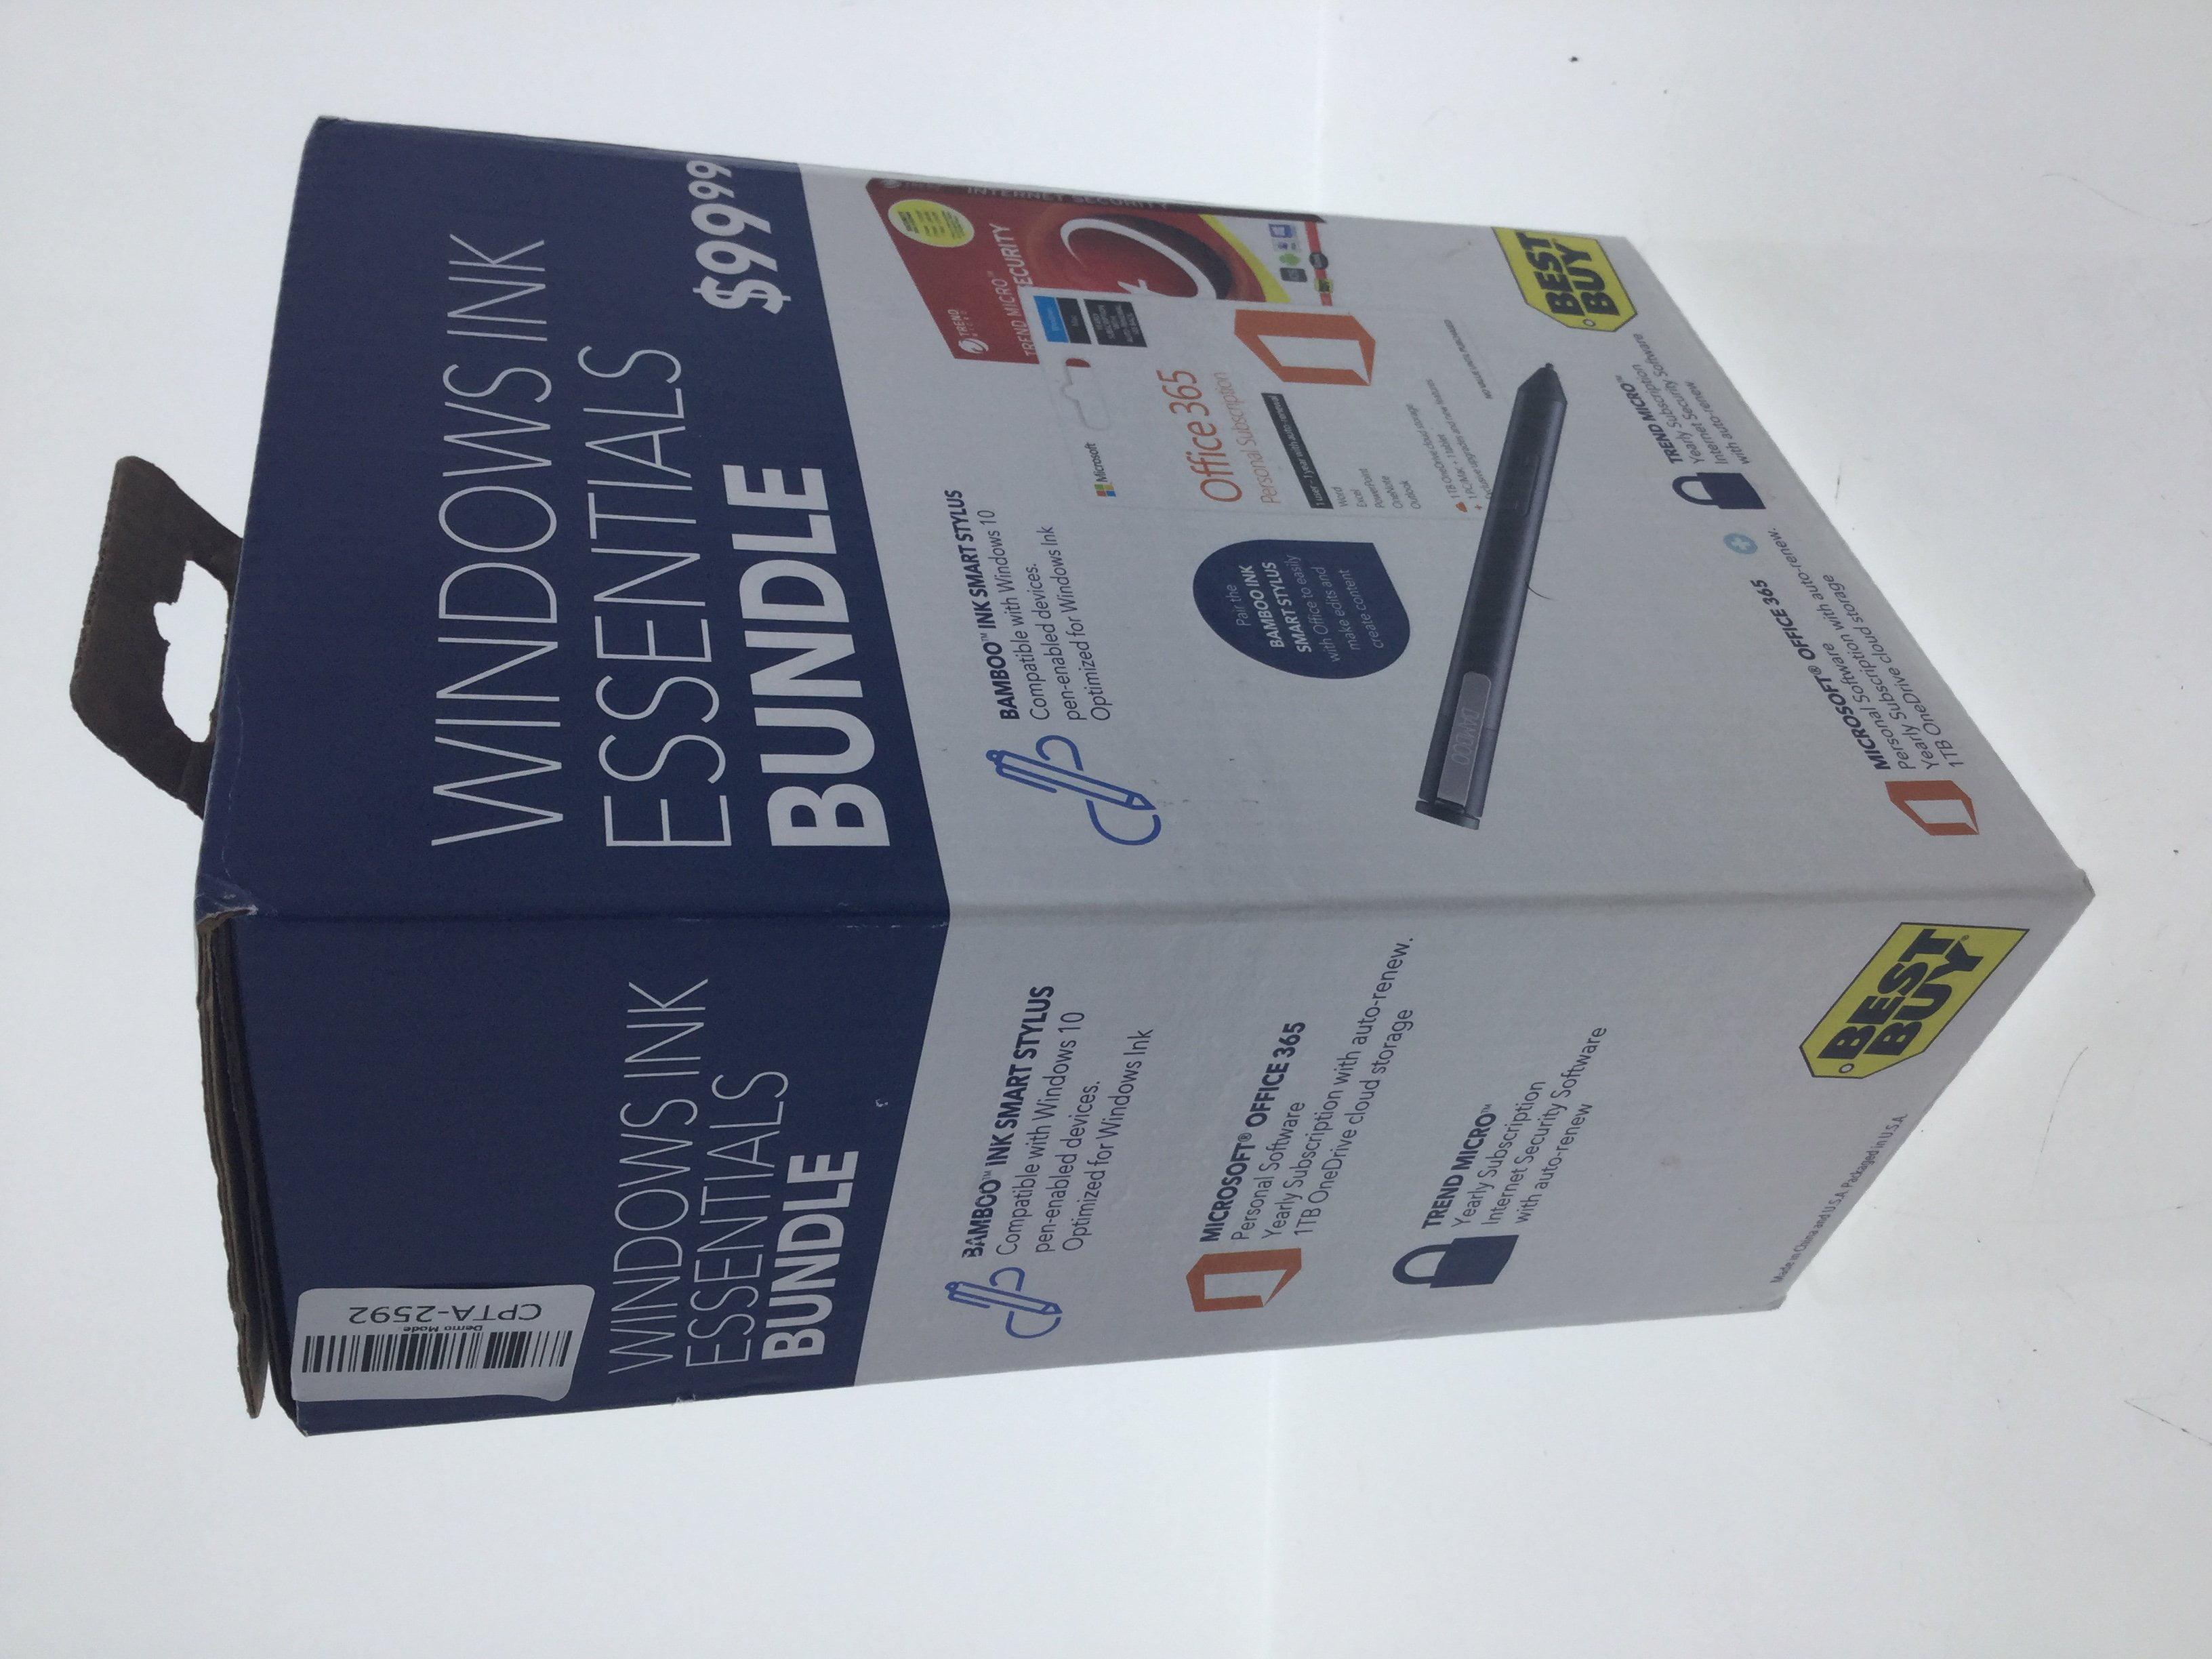 New Windows Ink Essentials Bundle ( Bamboo Ink Smart Stylus, Office 365,  Trend Micro